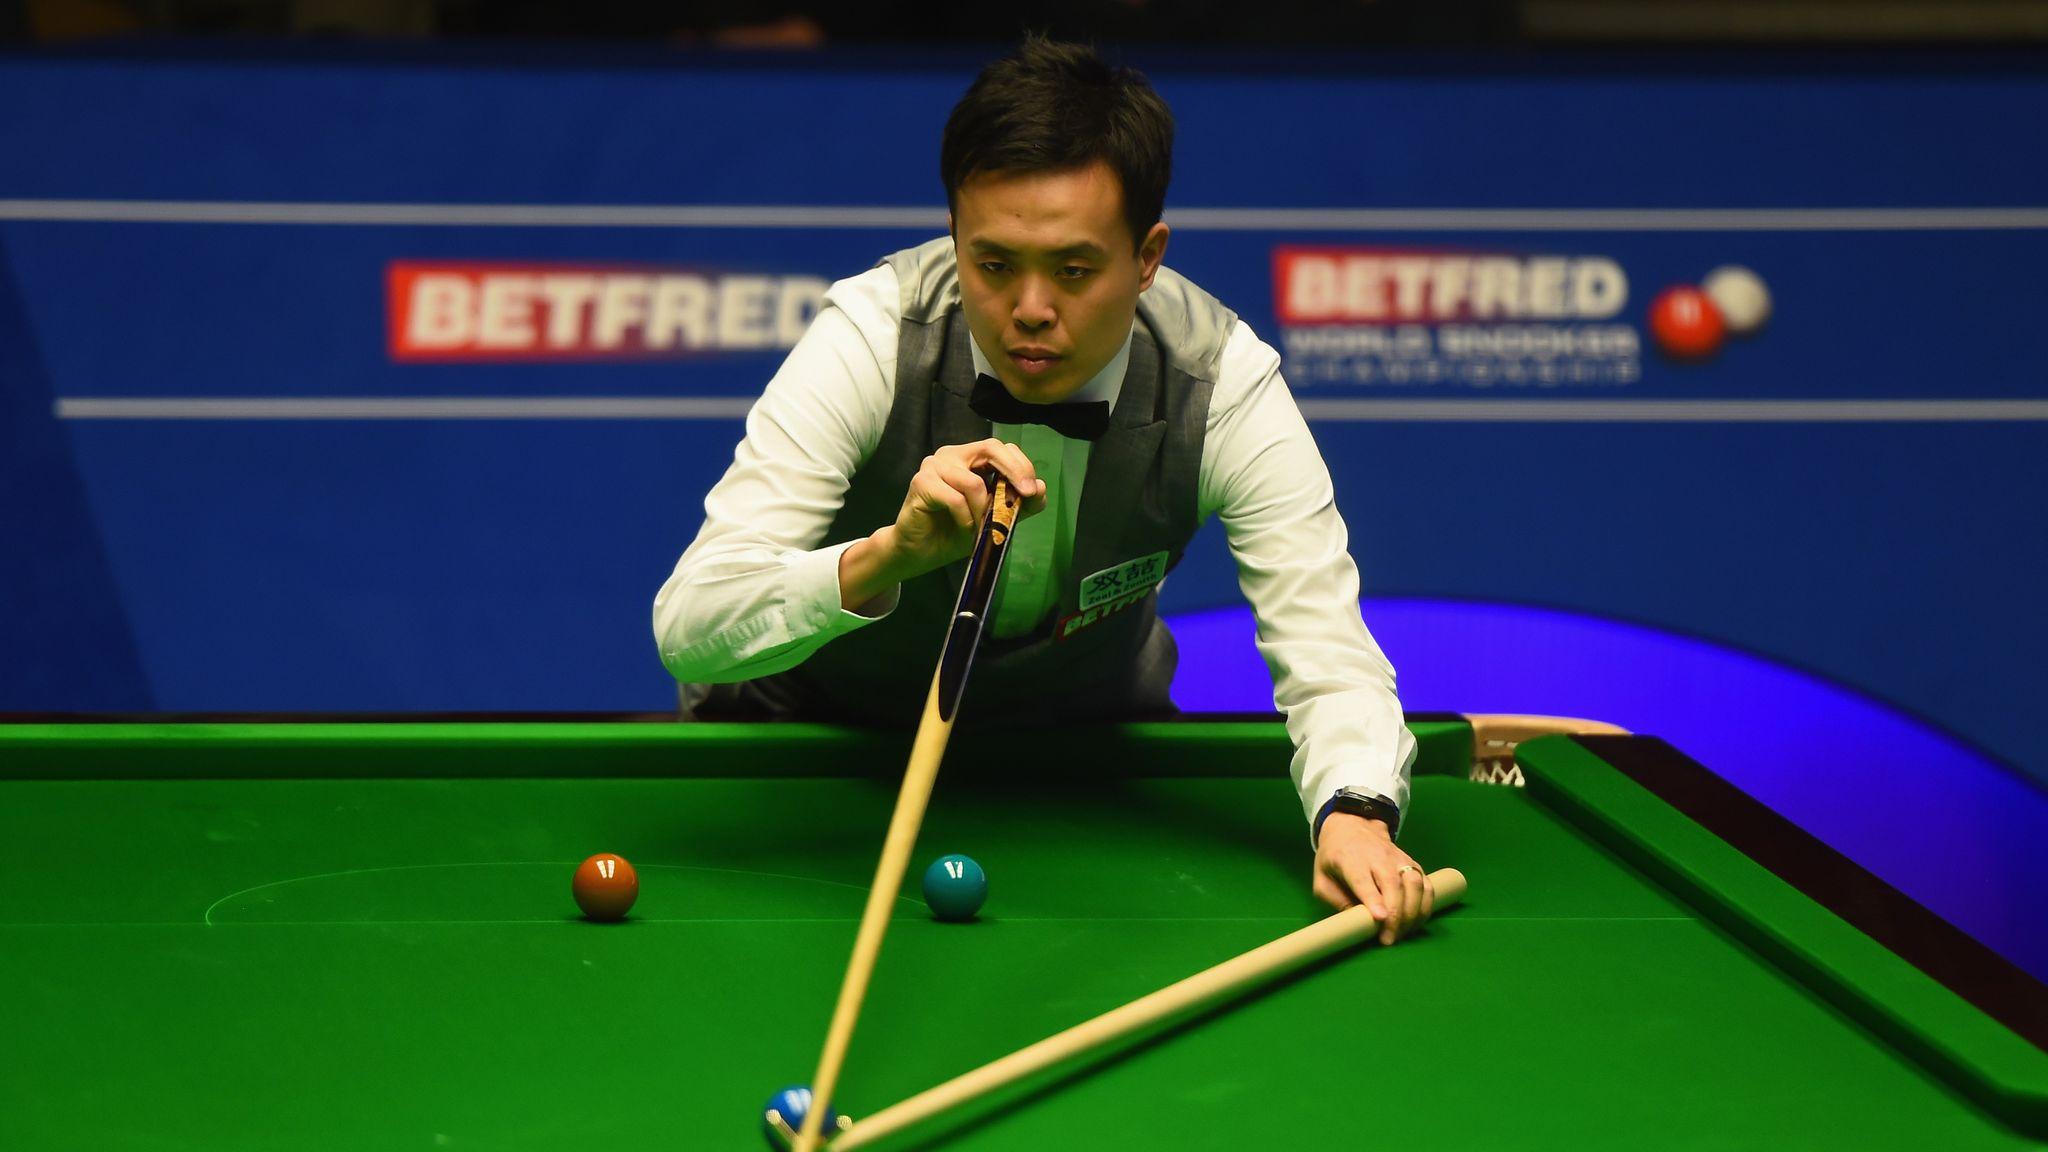 Marco Fu survives bizarre cue tip incident in Mark Selby semi ...